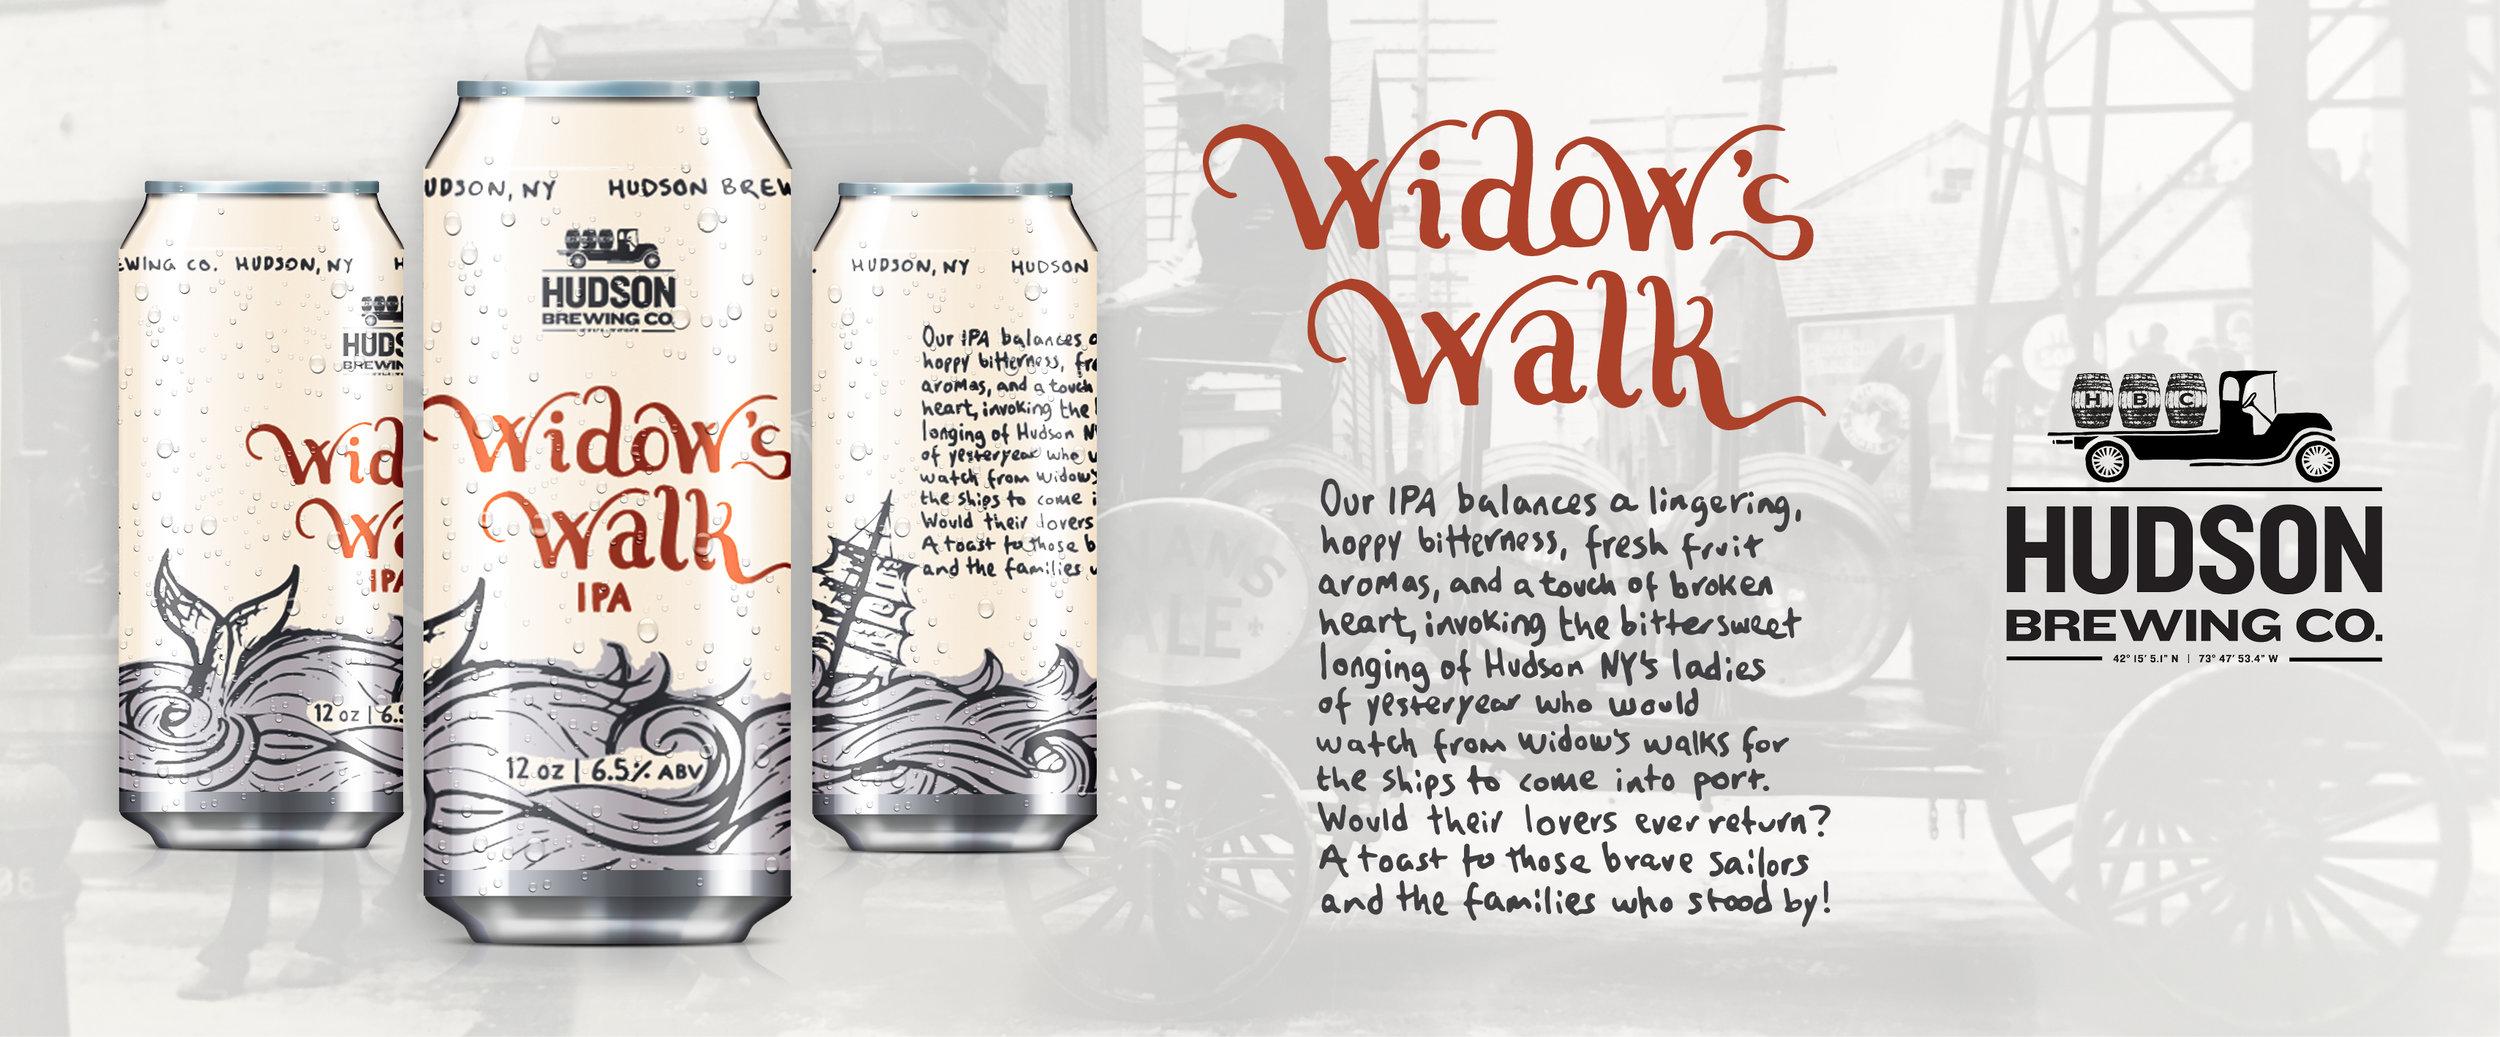 Final HBC widow's walk-FB banners.jpg